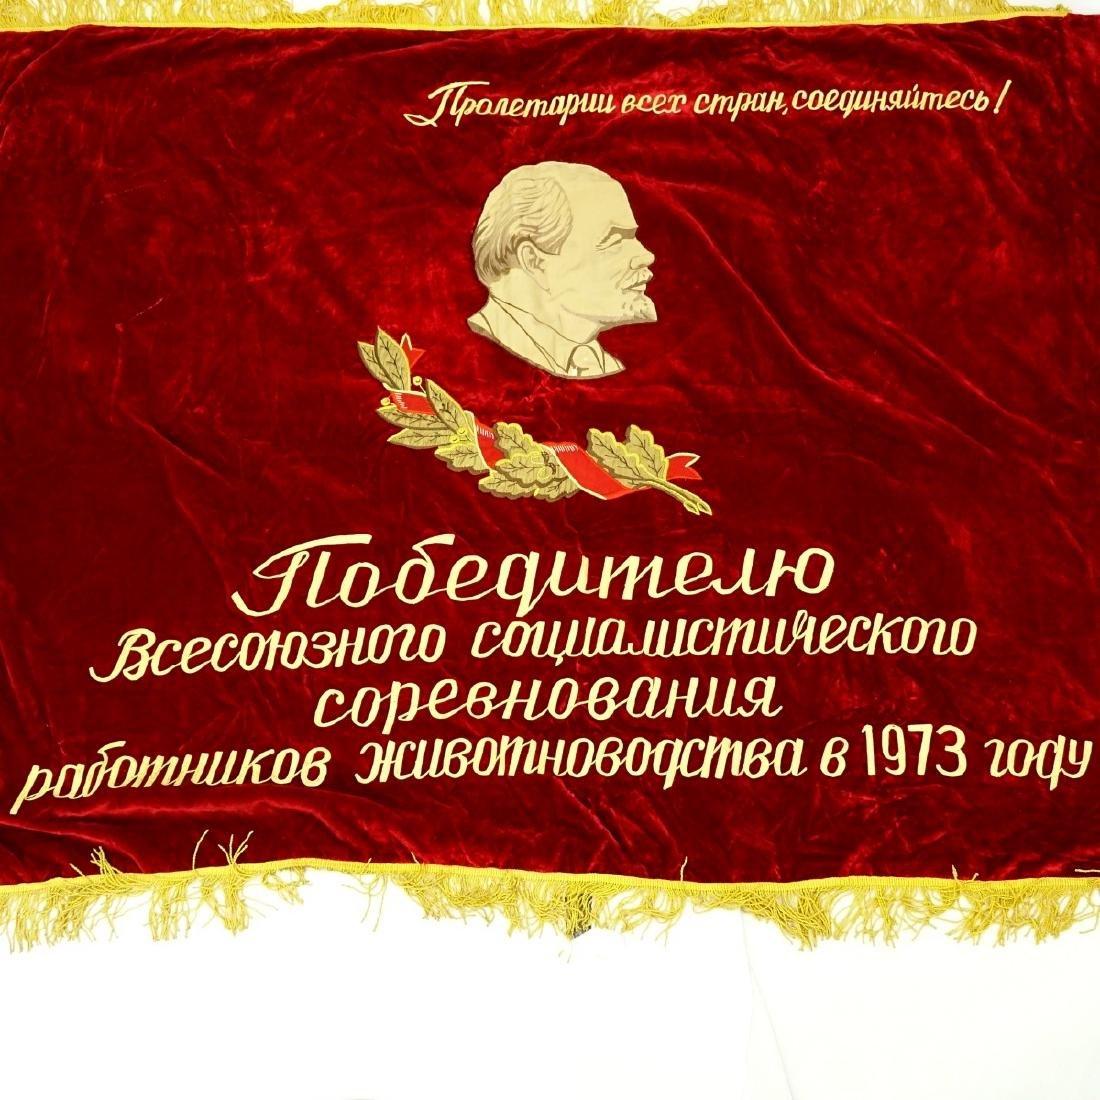 20th Century Russian Soviet Era Lenin-CCCP - 2